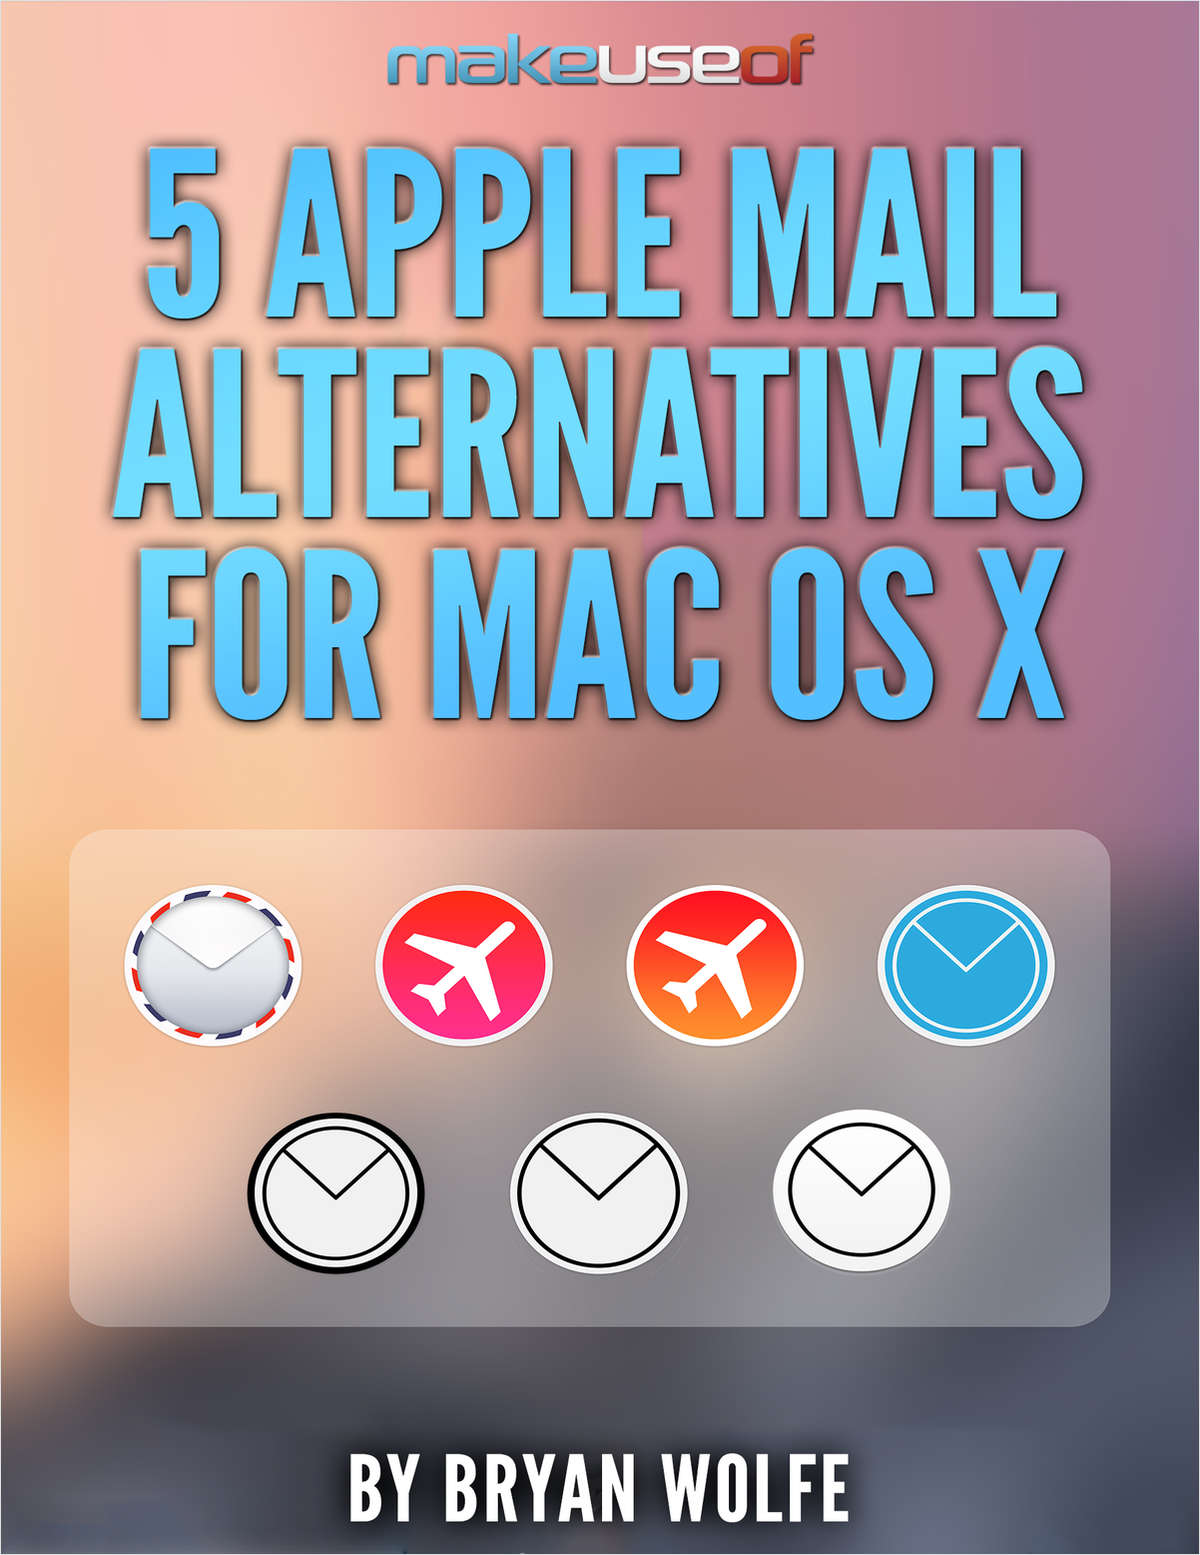 5 Apple Mail Alternatives for Mac OS X